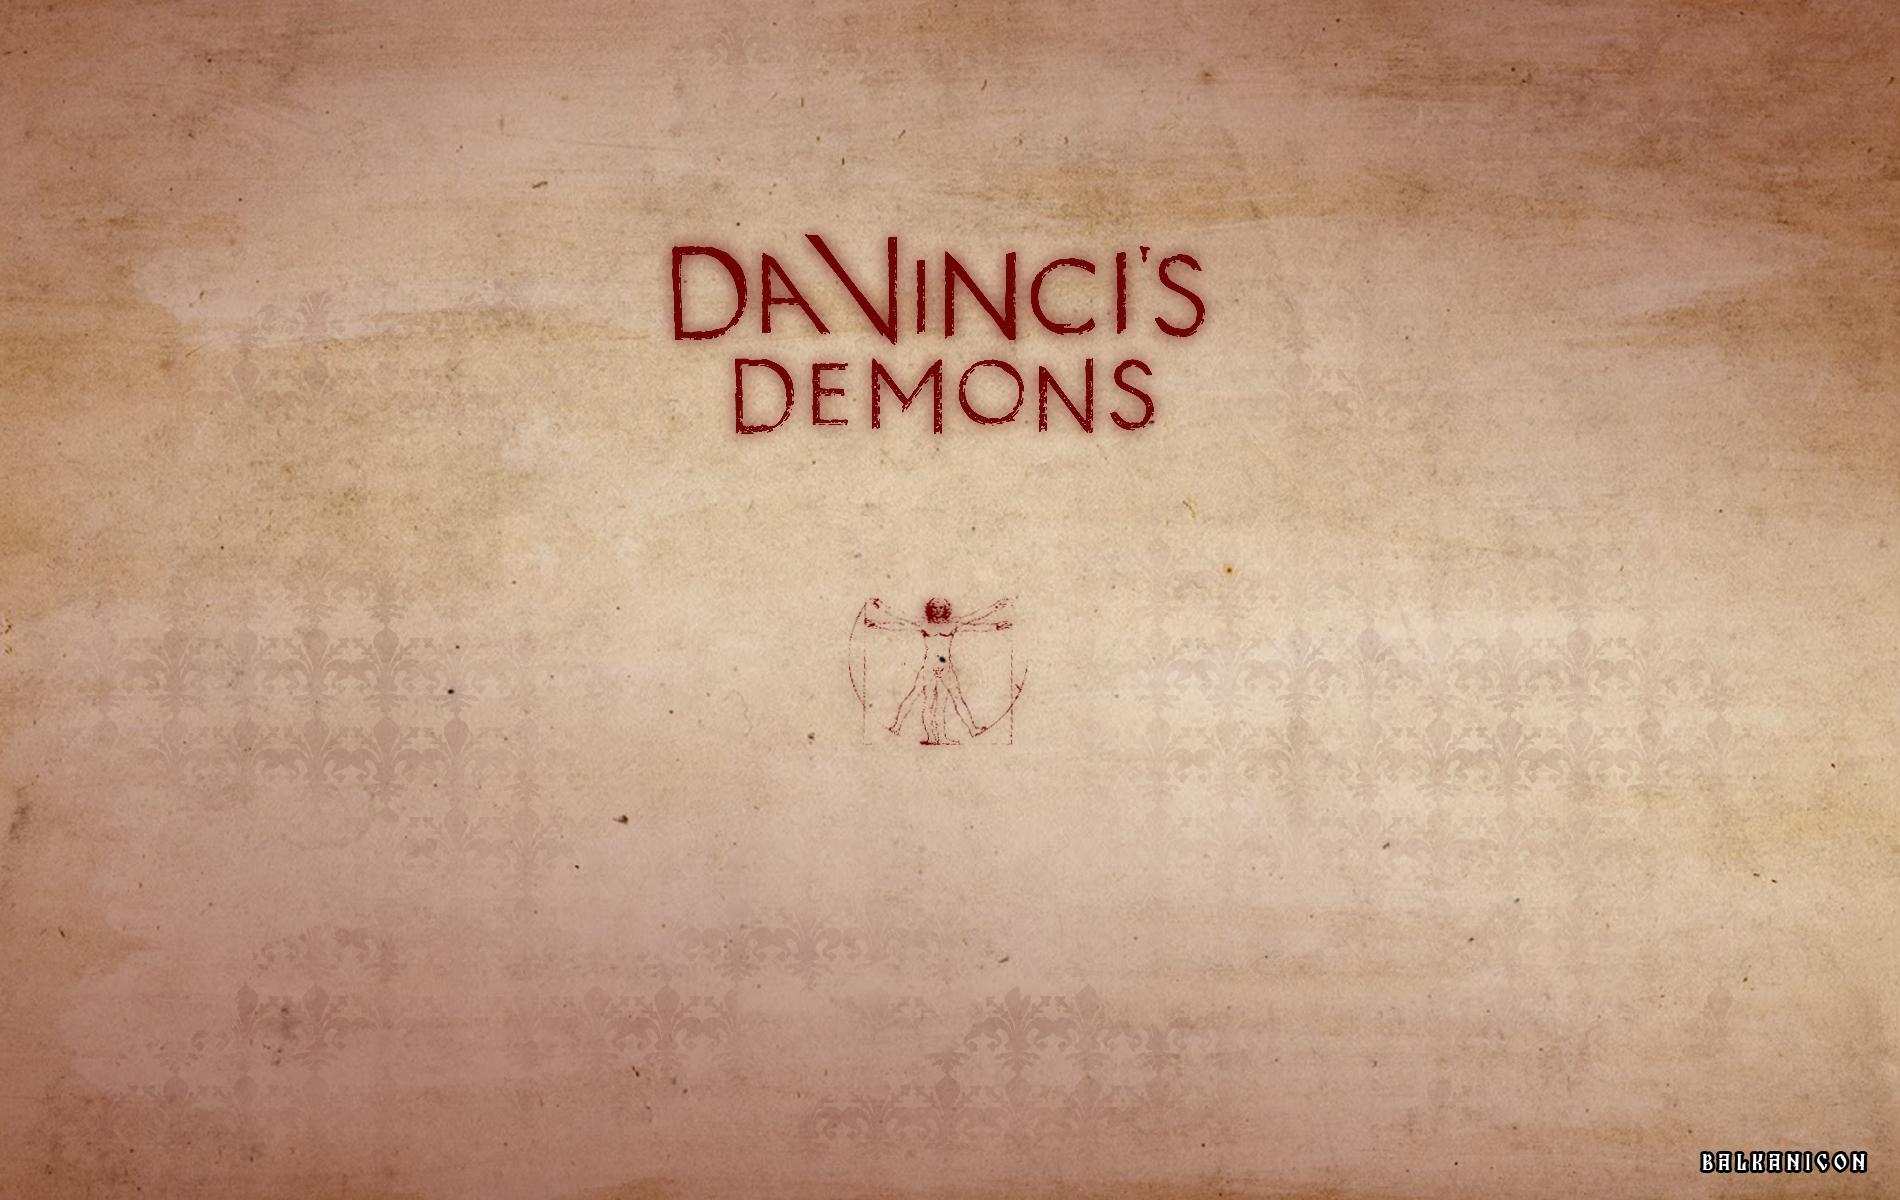 da vincis demons wallpaper - photo #20